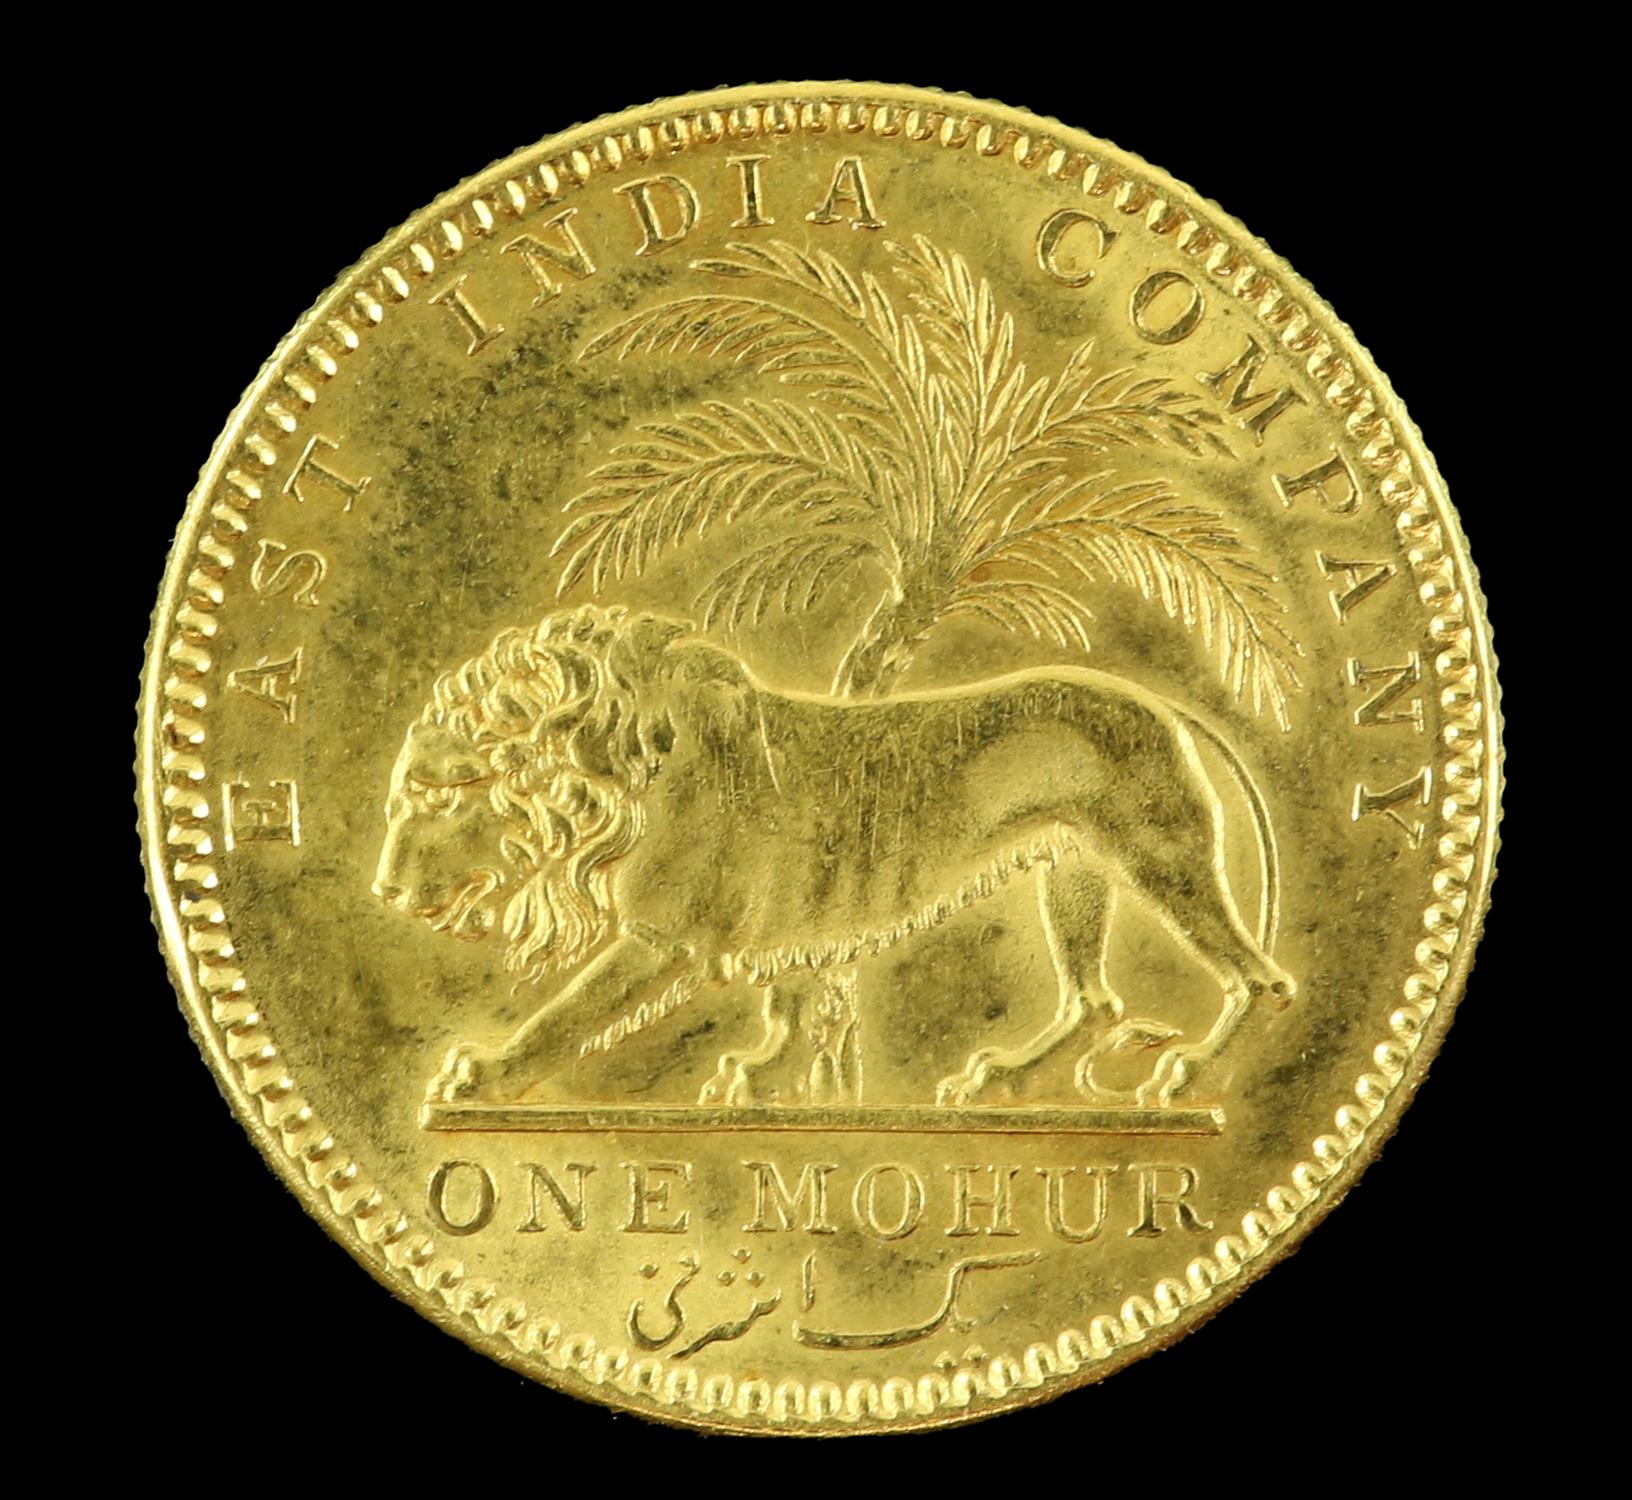 East India Company gold Mohur 1841